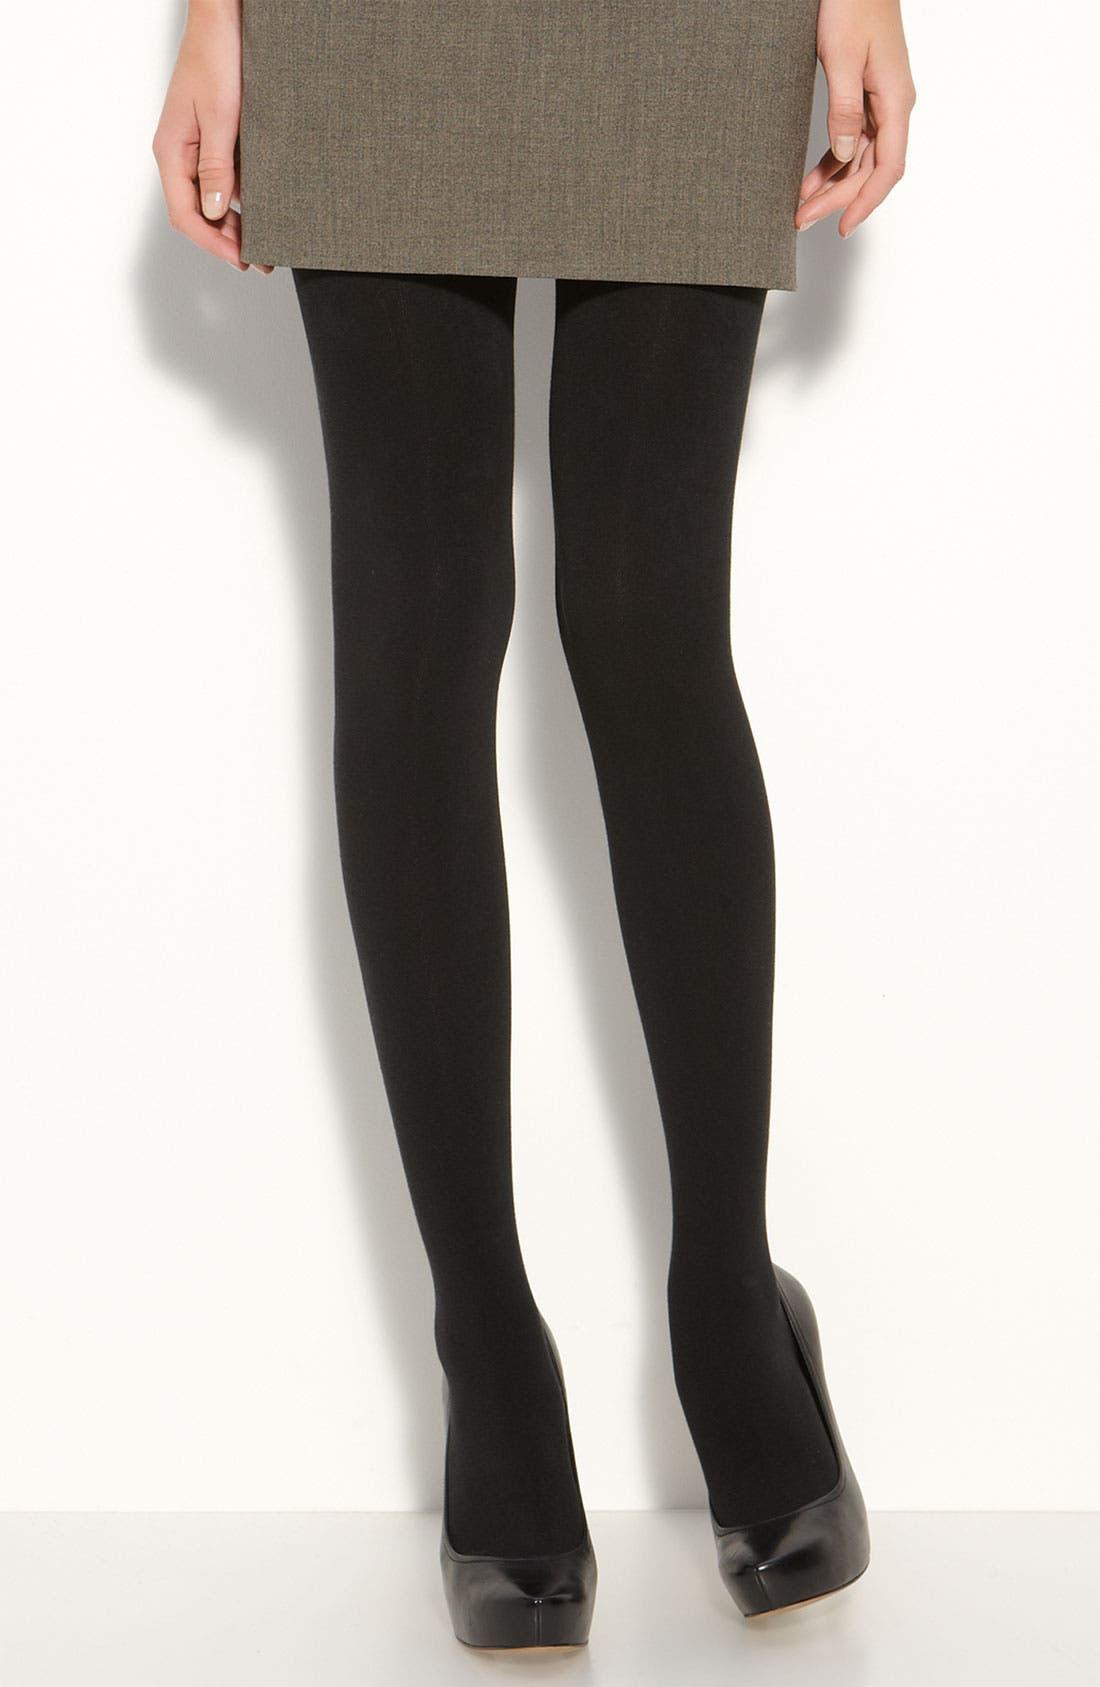 Main Image - Donna Karan 'Luxe Layer' Tights